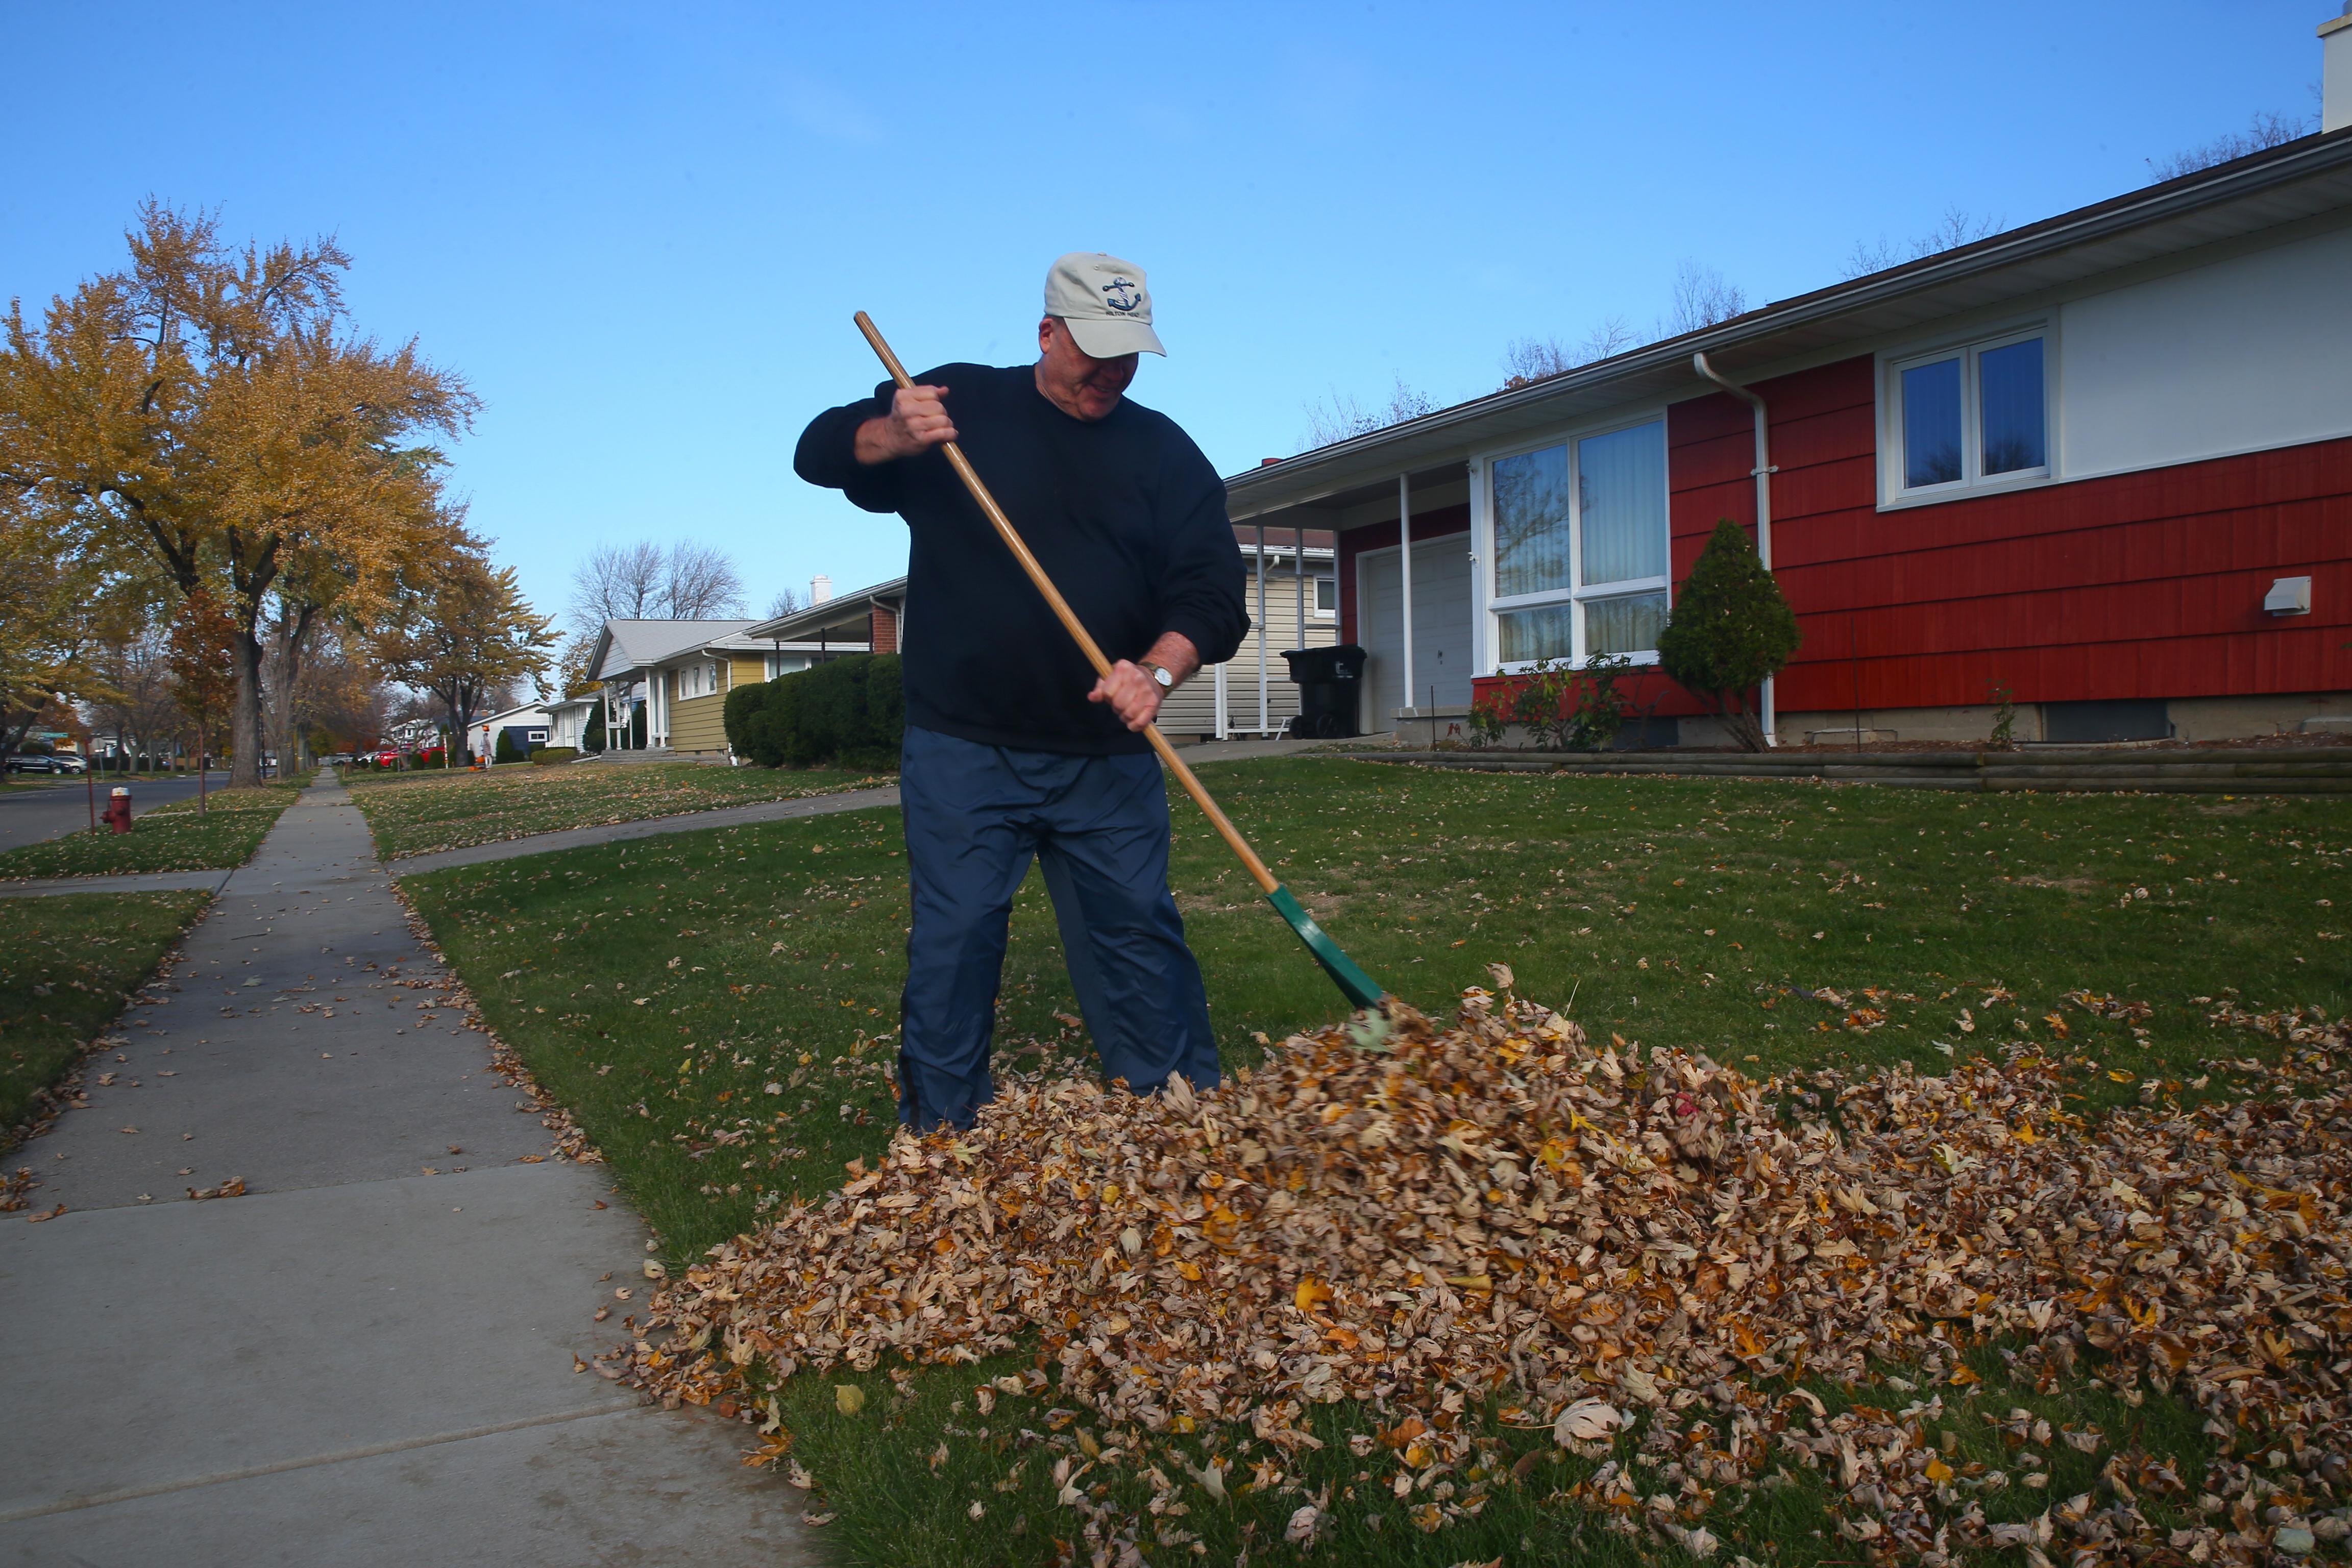 Gary Wilger rakes leaves for a neighbor on  Evergreen Drive on  Monday, Nov. 14, 2016 in the Town of Tonawanda. (John Hickey/Buffalo News)